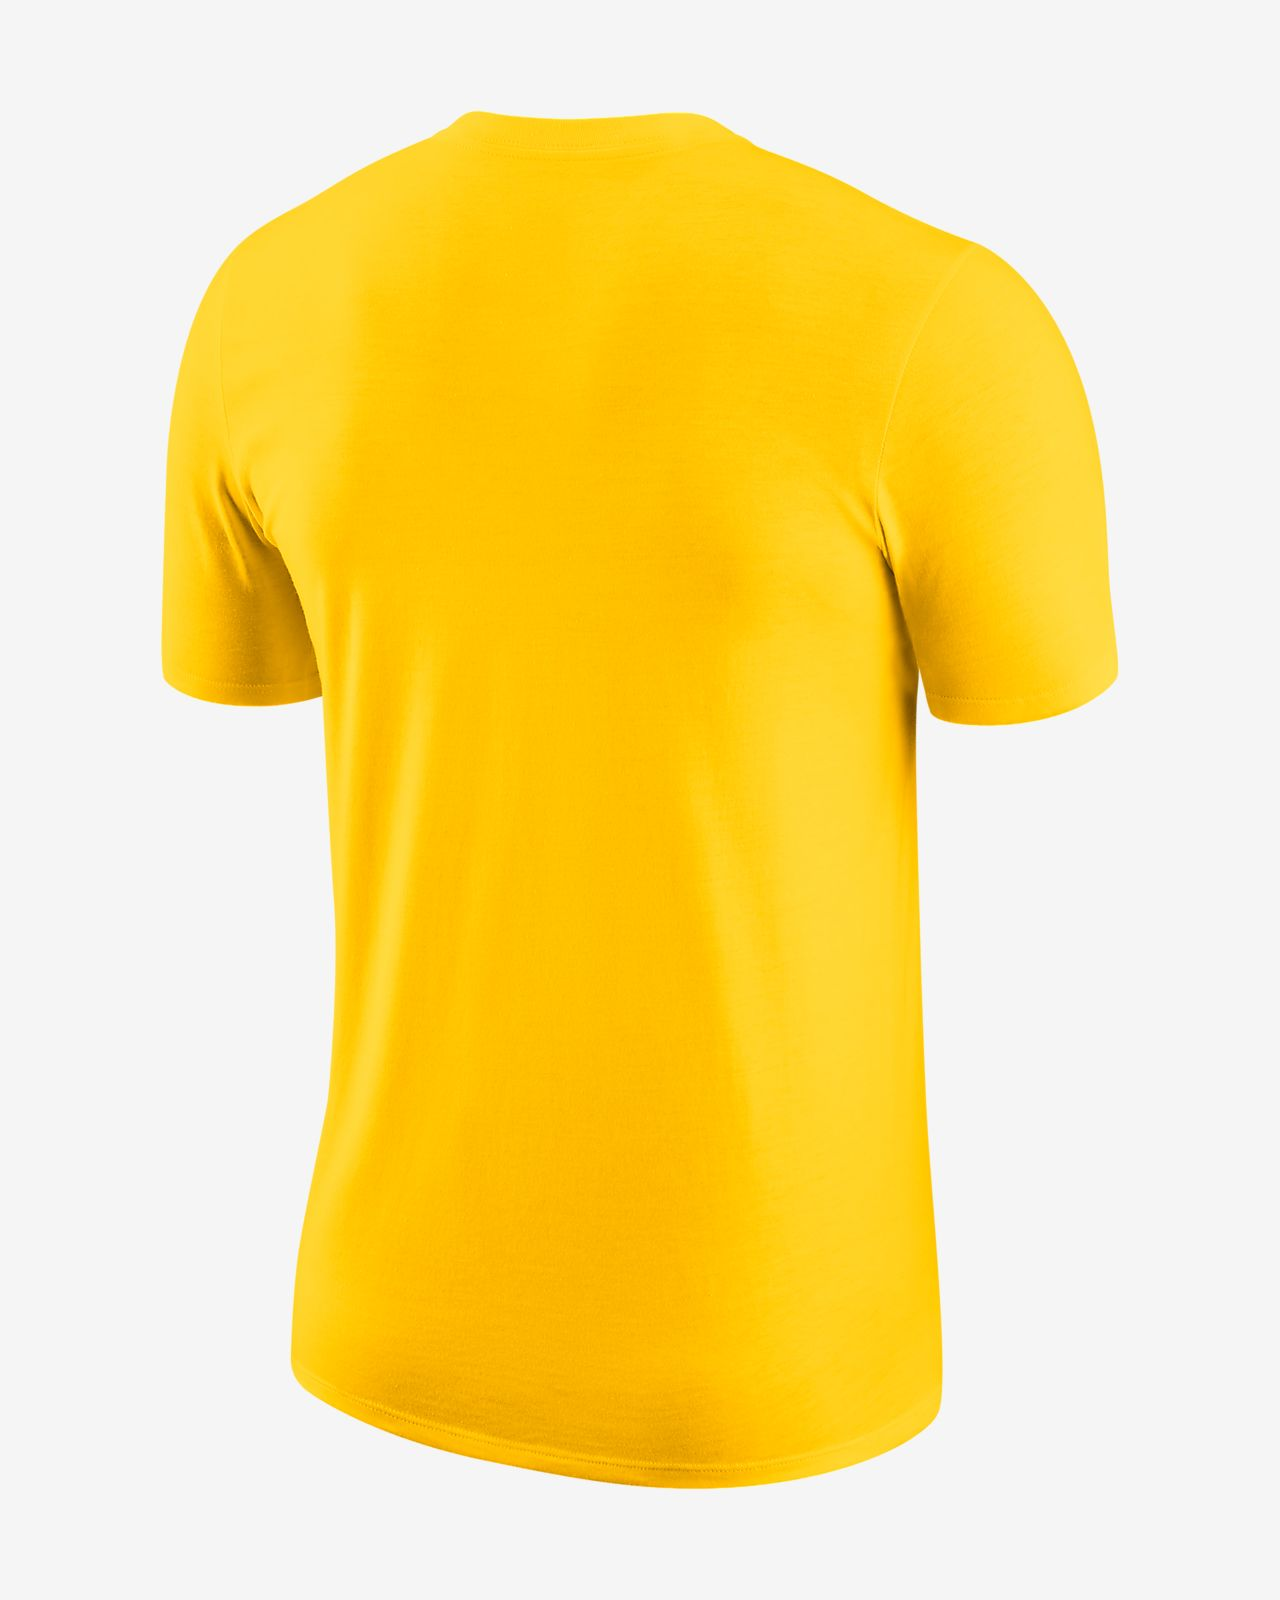 bffc6ebff0c Los Angeles Lakers Nike Dri-FIT Men s NBA T-Shirt. Nike.com